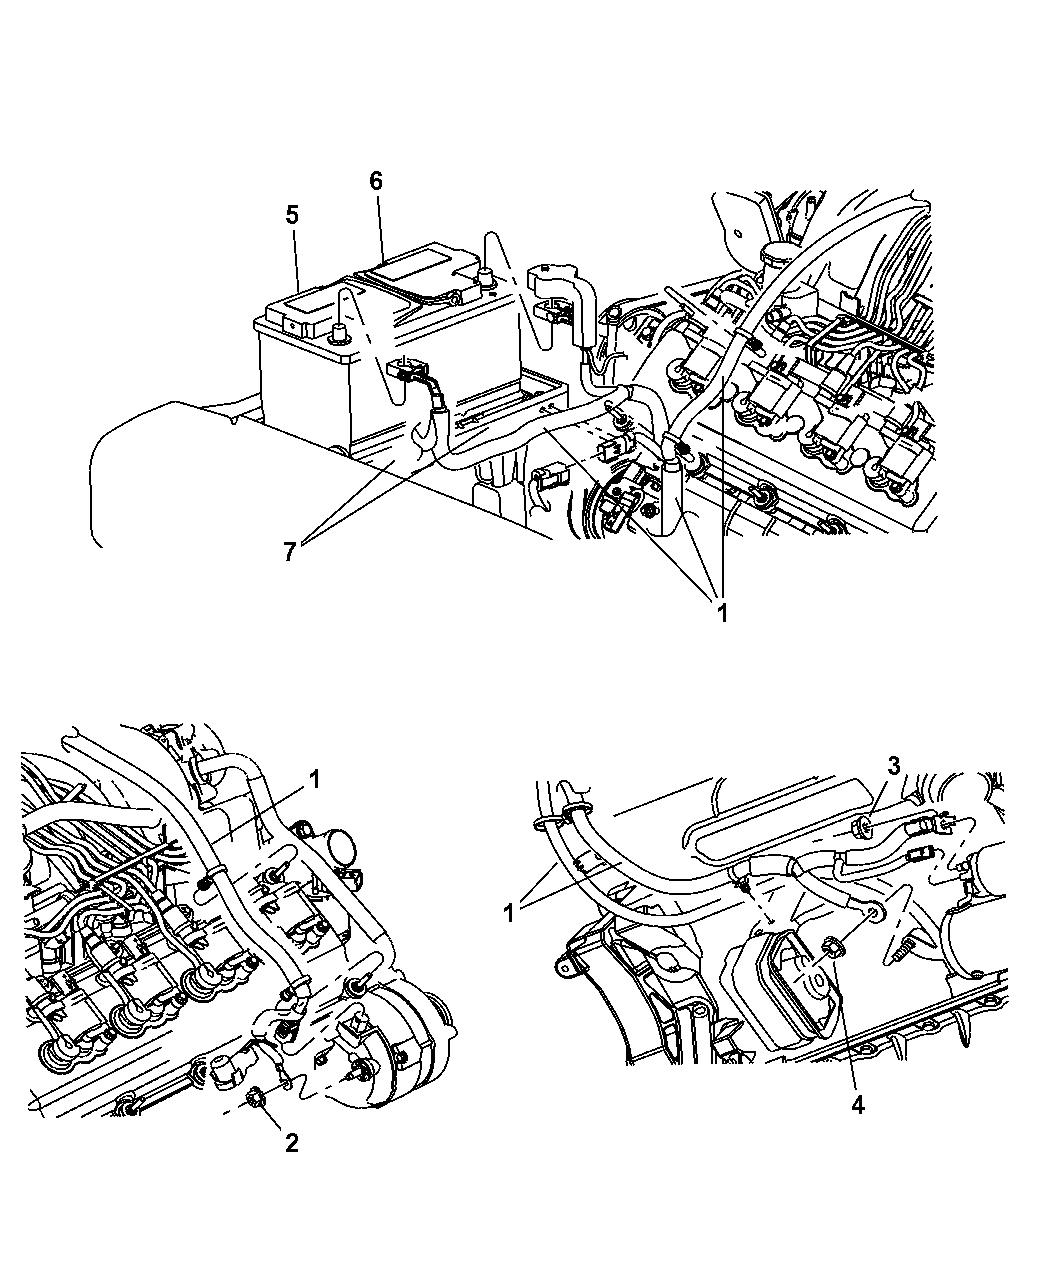 56044194AE - Genuine Jeep WIRING-ALTERNATOR AND BATTERY